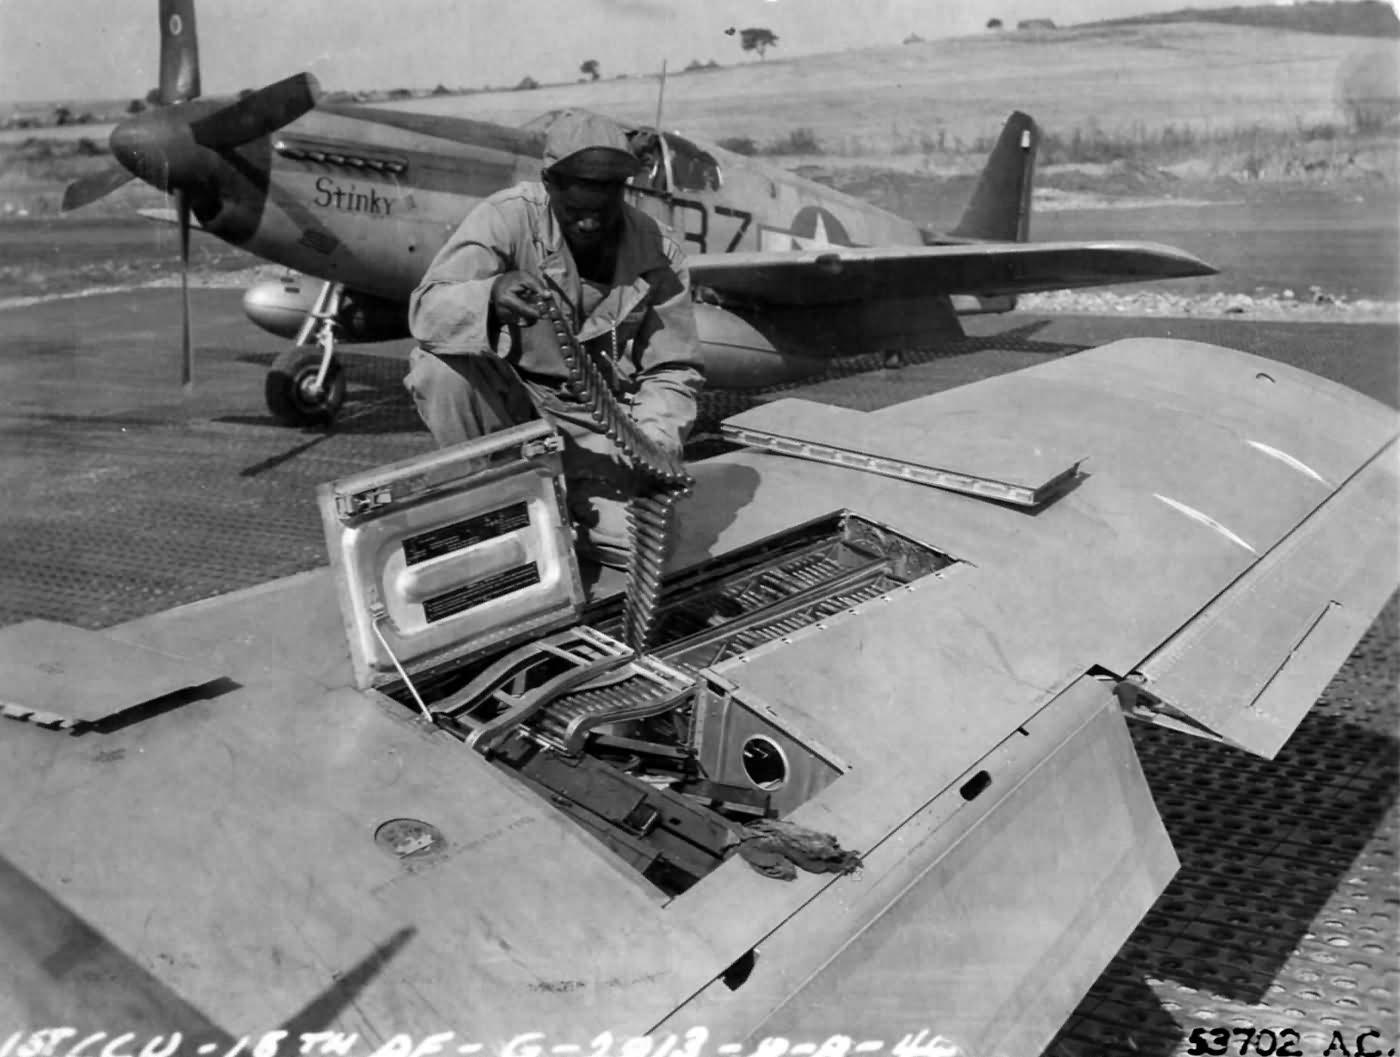 P-51-C-Stinky-Ii-of-the-100th-FS-332nd-F